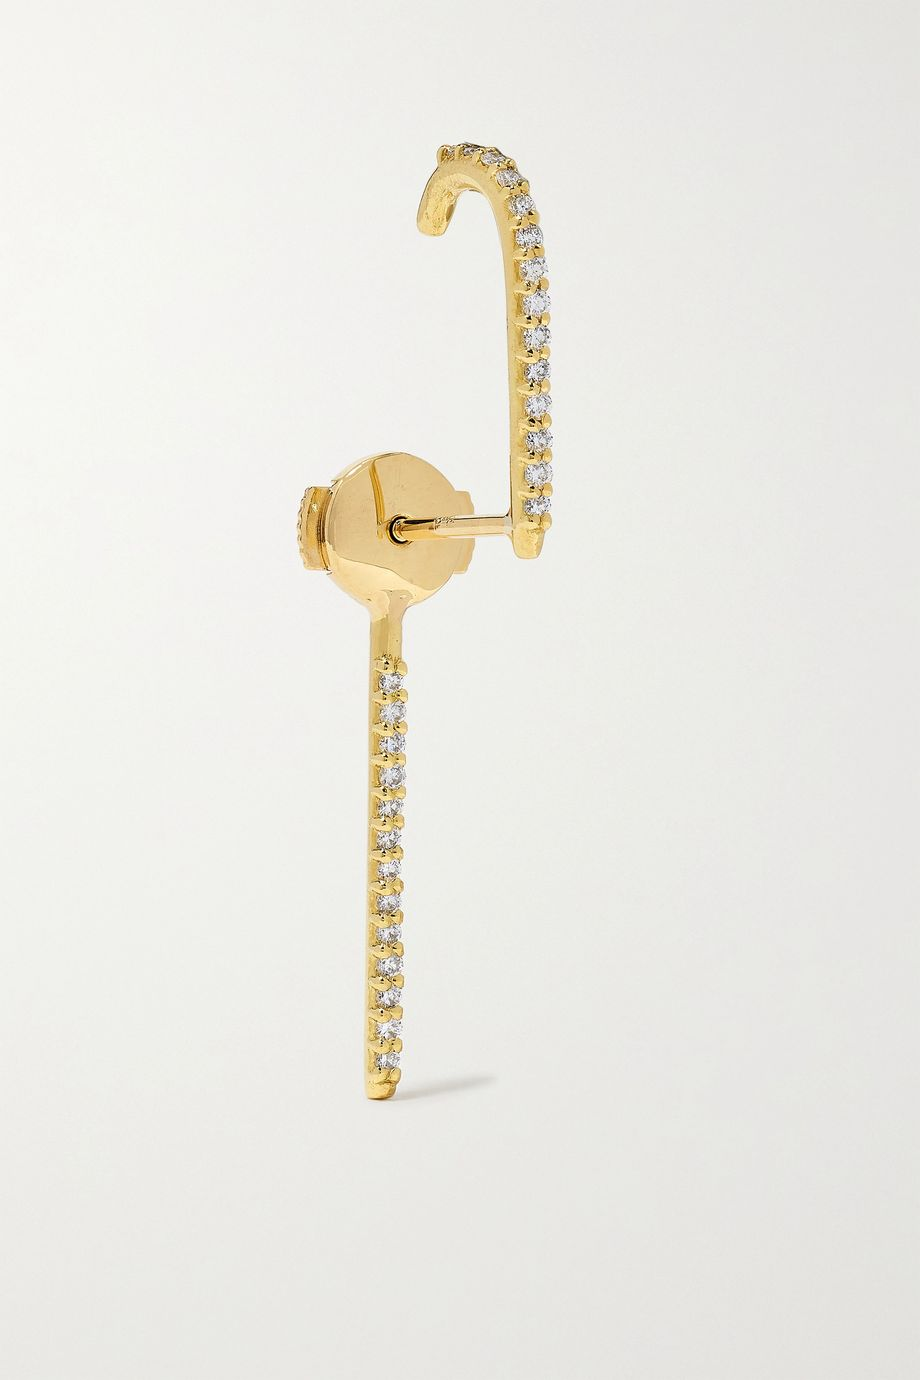 KATKIM Gold diamond earring